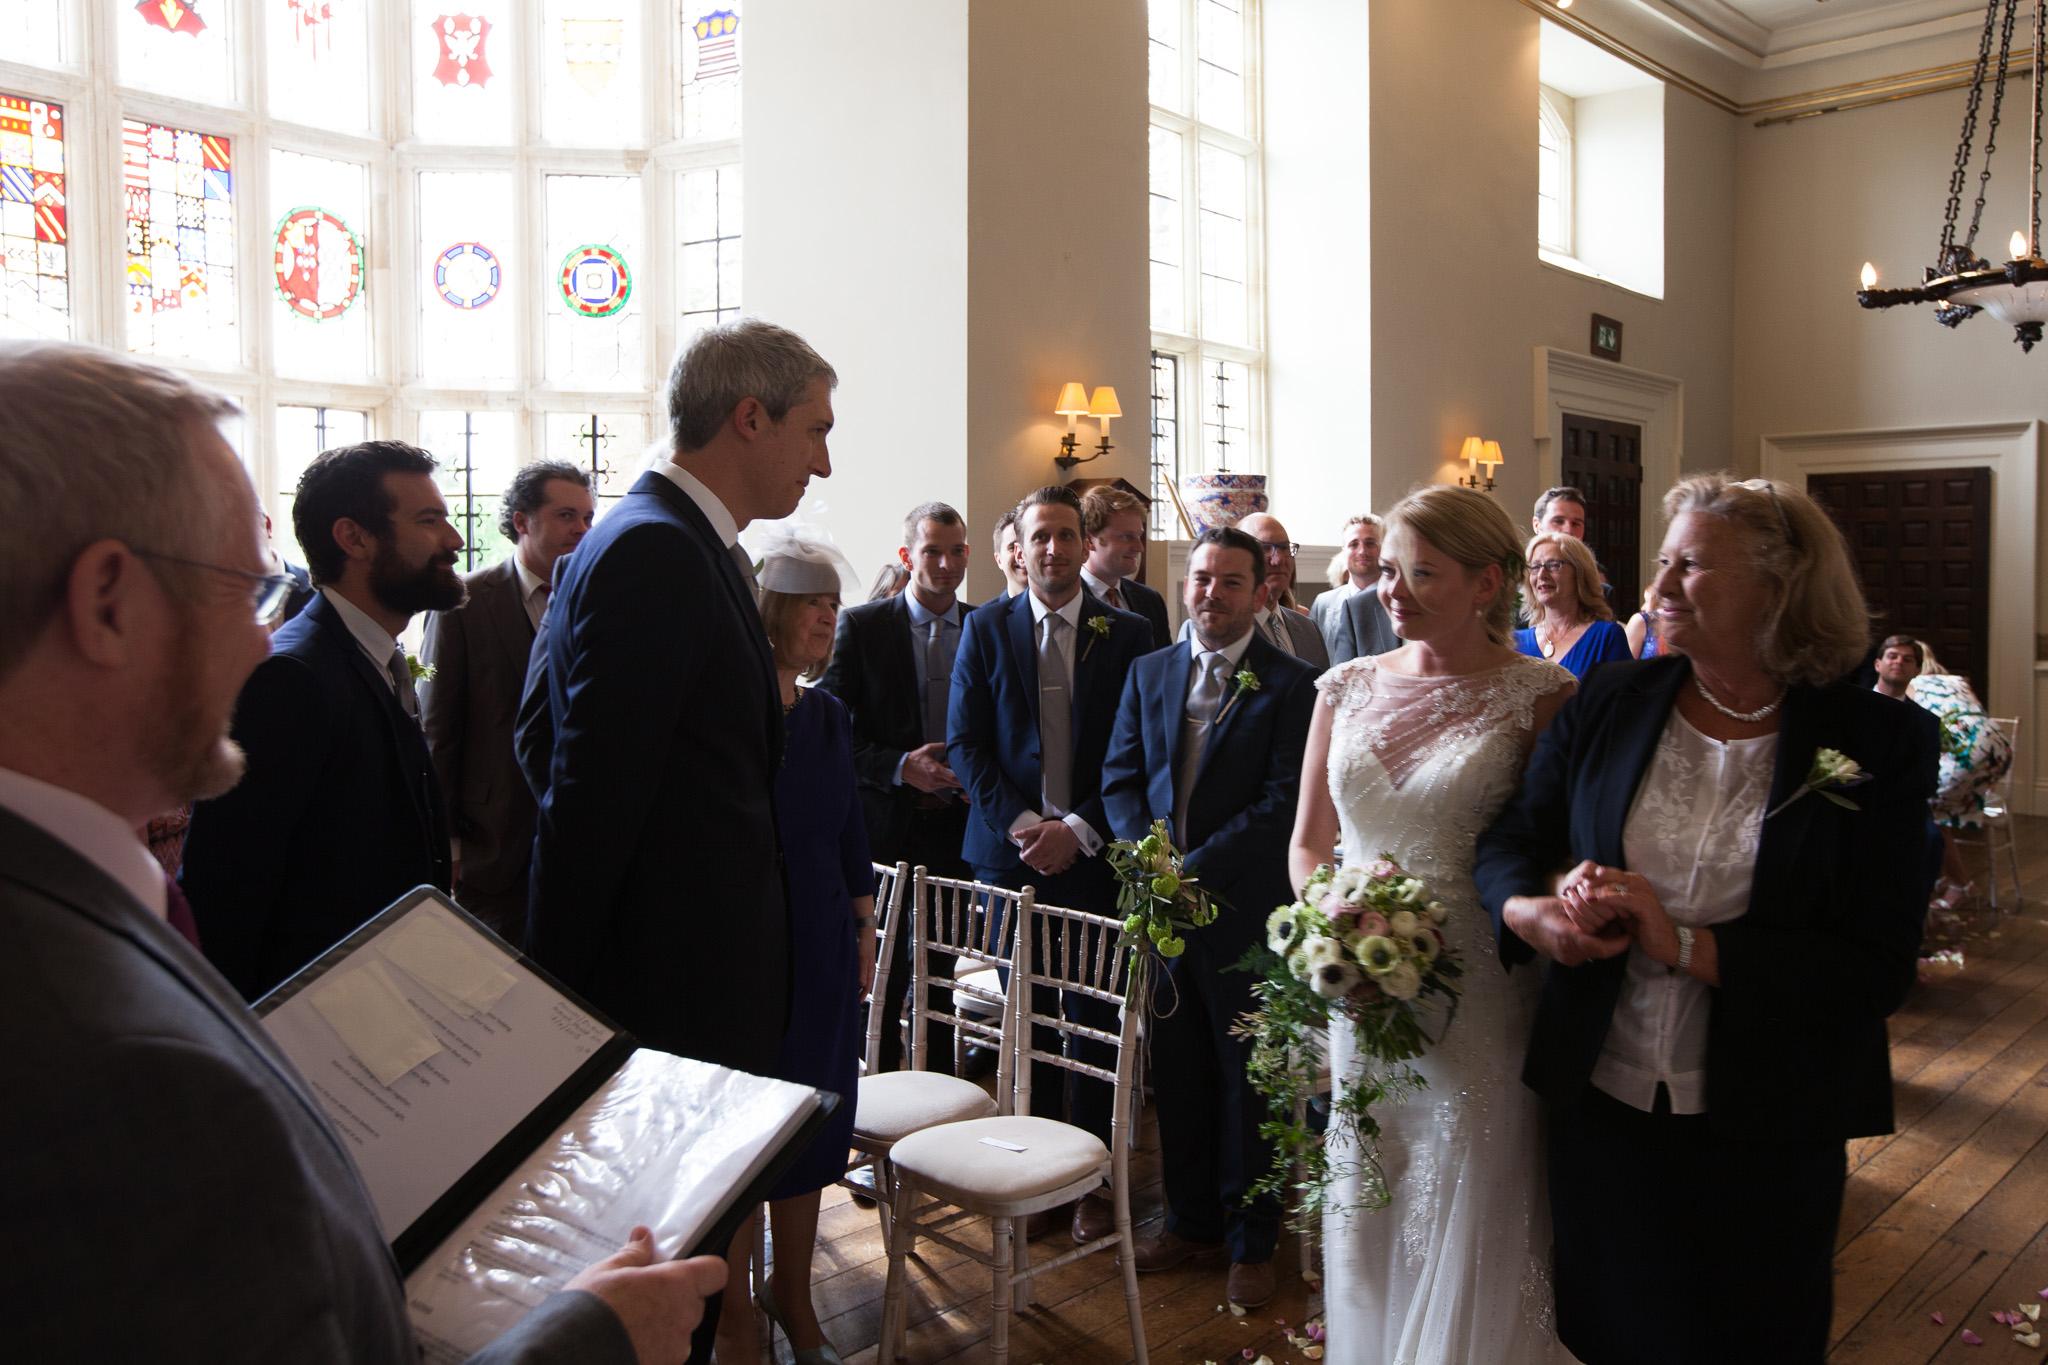 Mark_Barnes_Gloucester_Wedding_Photographer_Elmore_Court_Wedding_Photography_Mike+Kelly-40.jpg